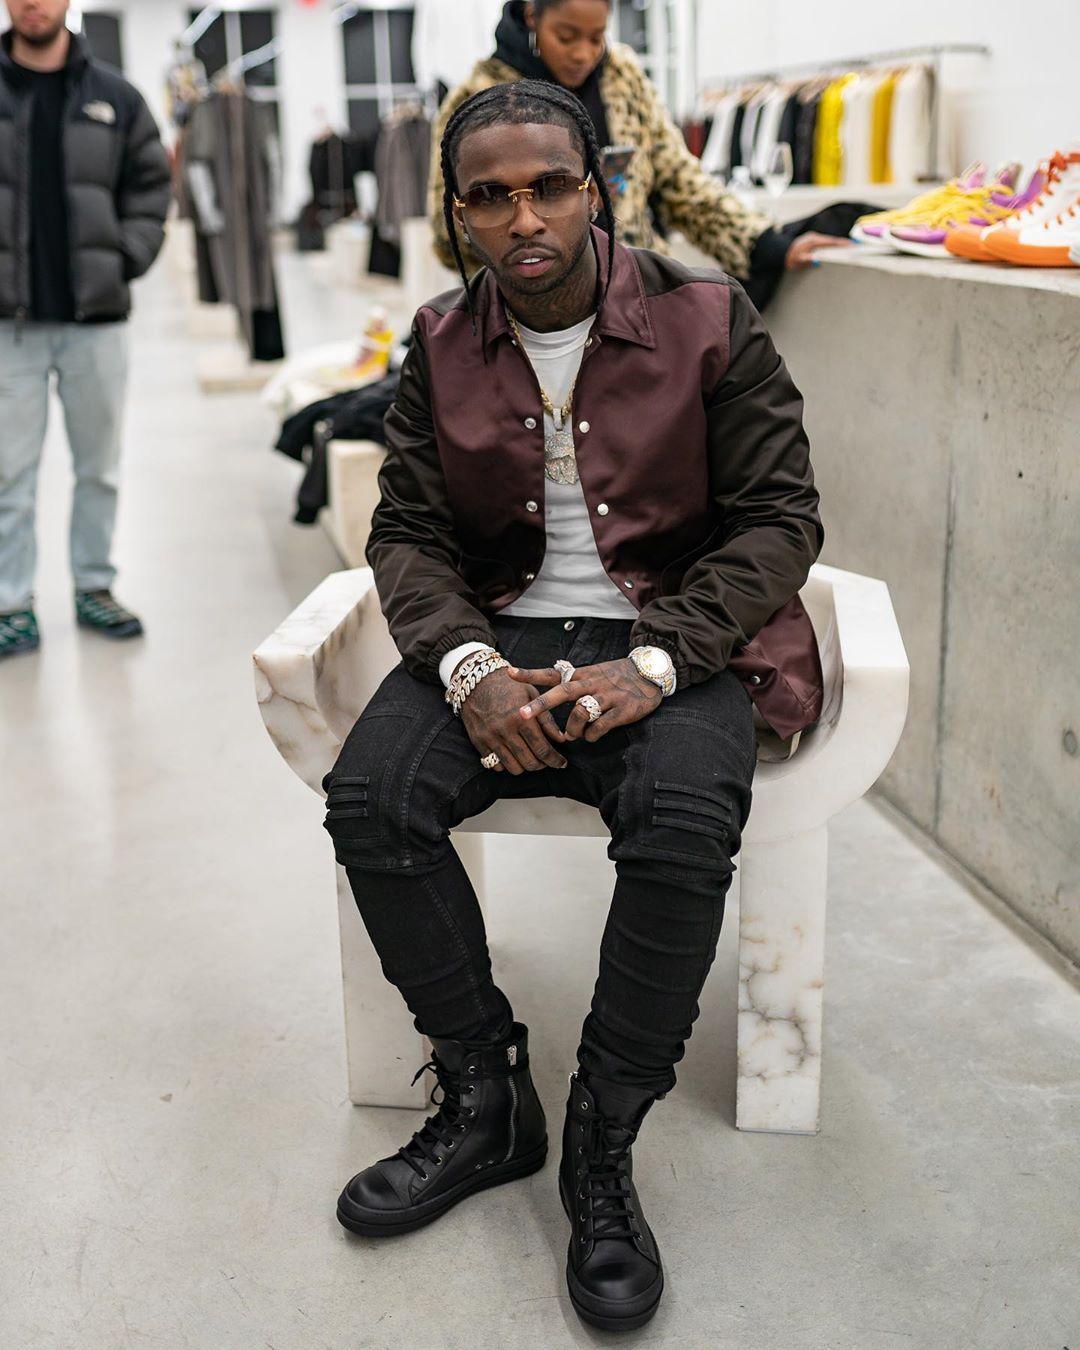 Chris brown image by Nyla Stevenson in 2020 Hip hop